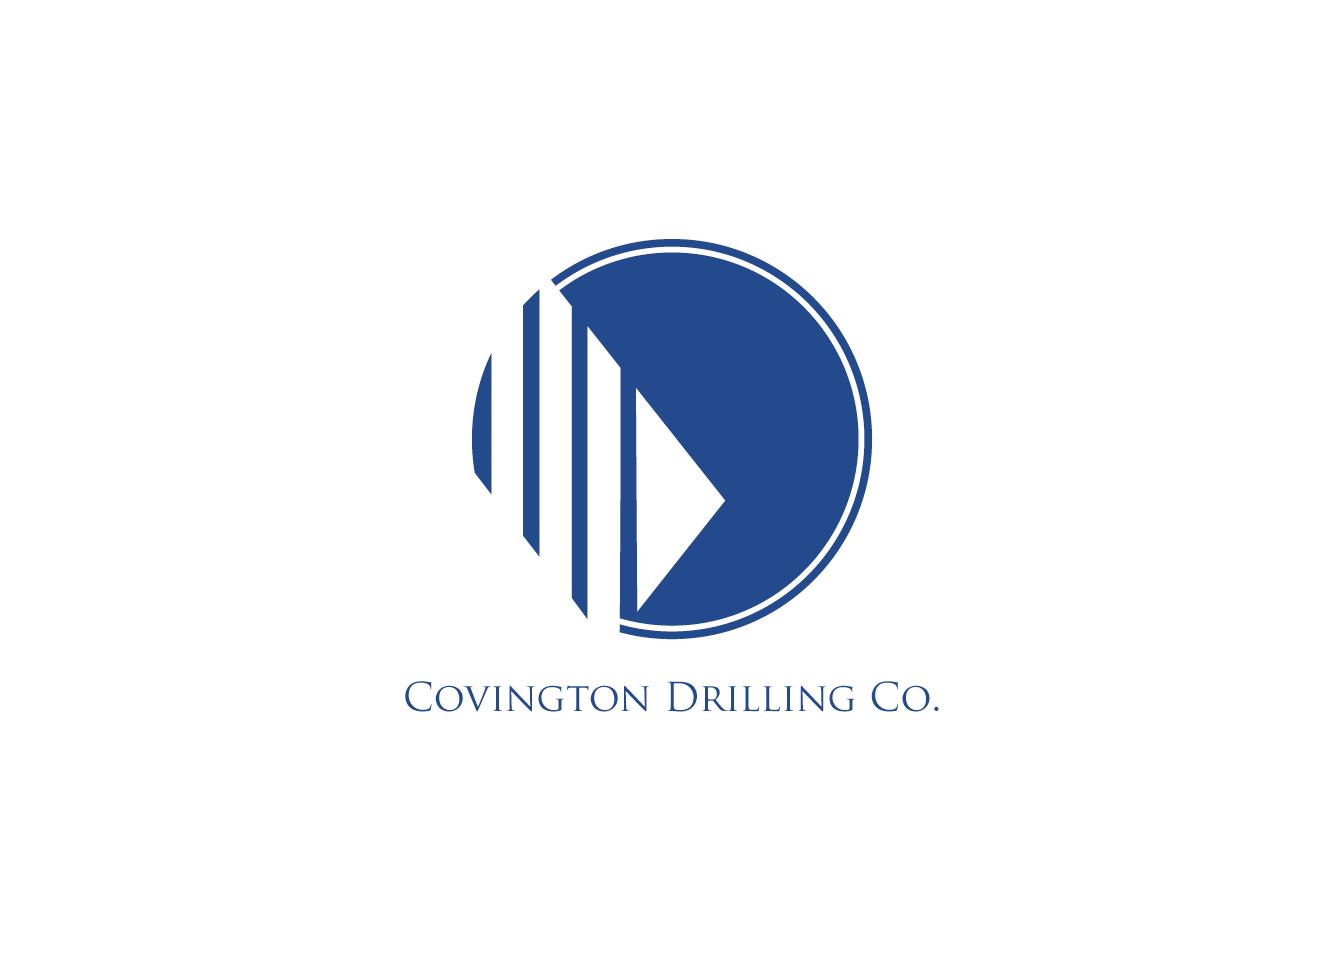 Covington Drilling